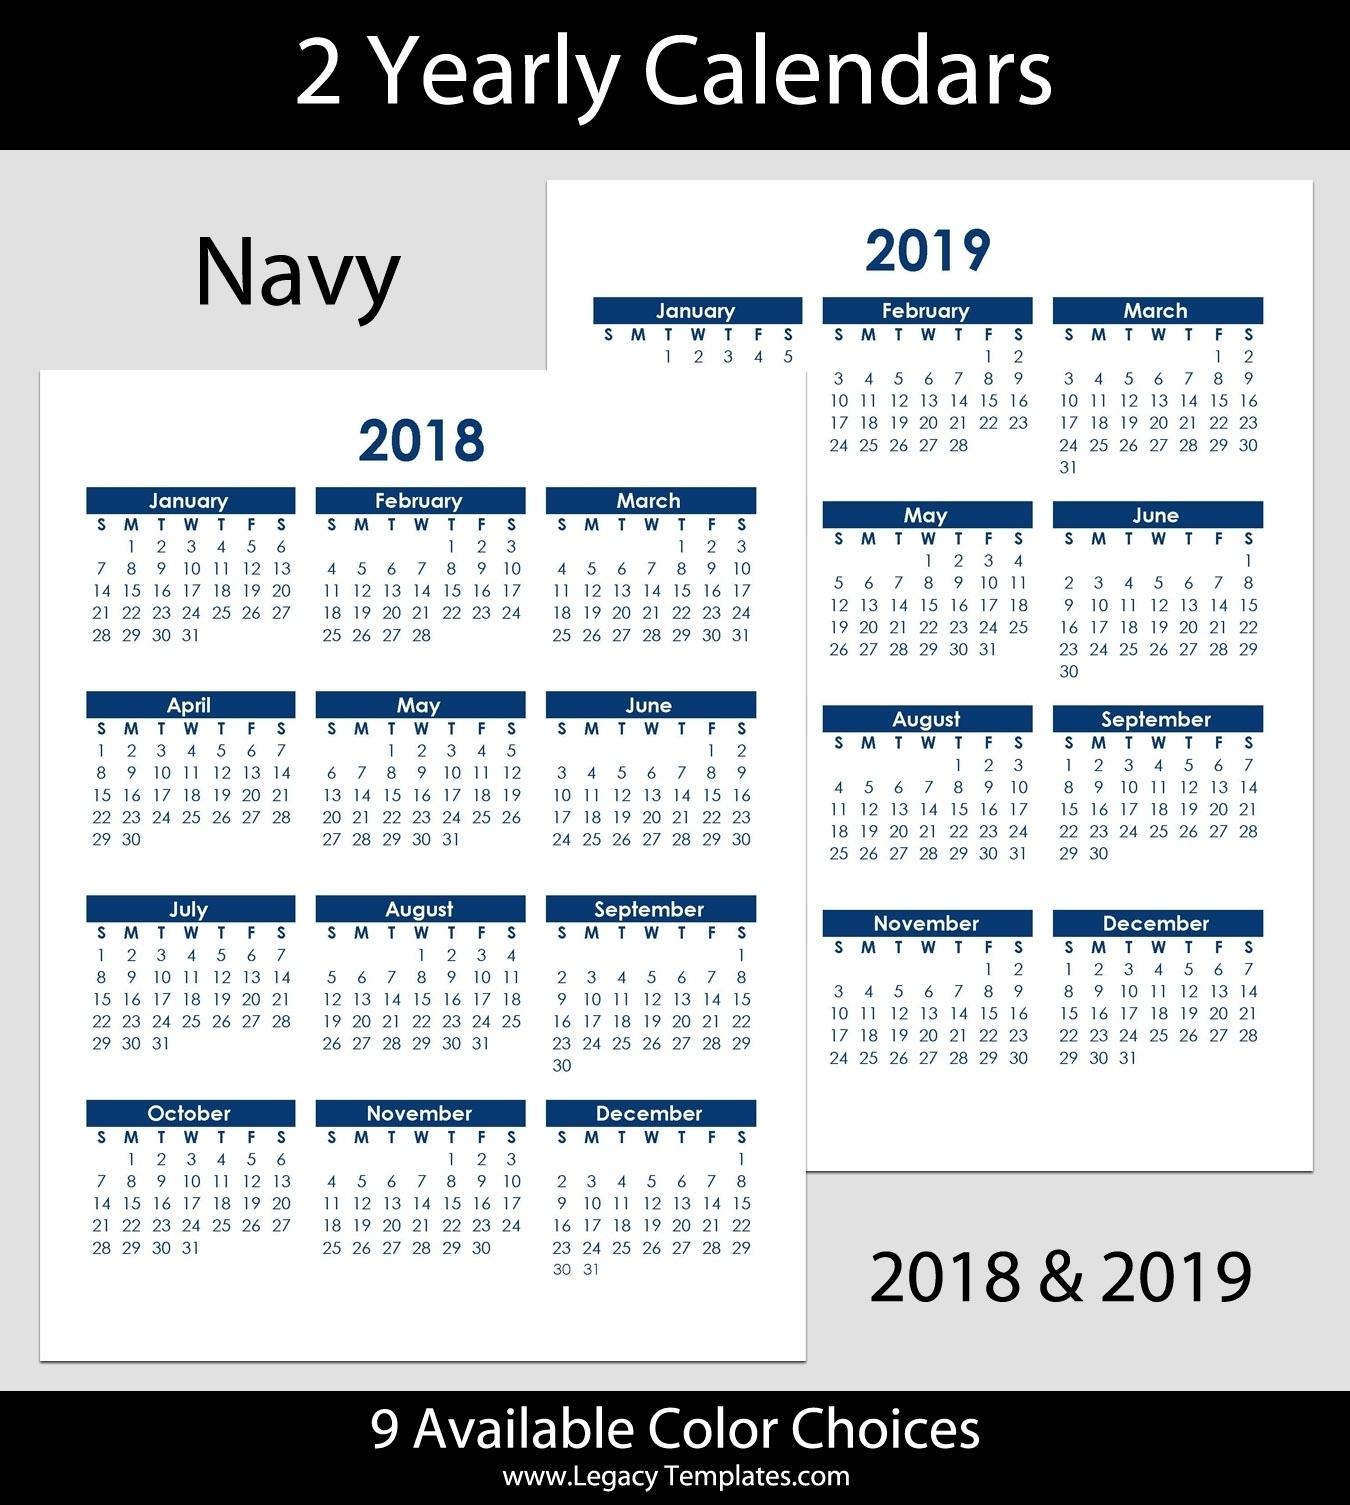 8.5 X 14 Calendar Template • Printable Blank Calendar Template within Free Yearly 5.5 X 8.5 Calendar 2020